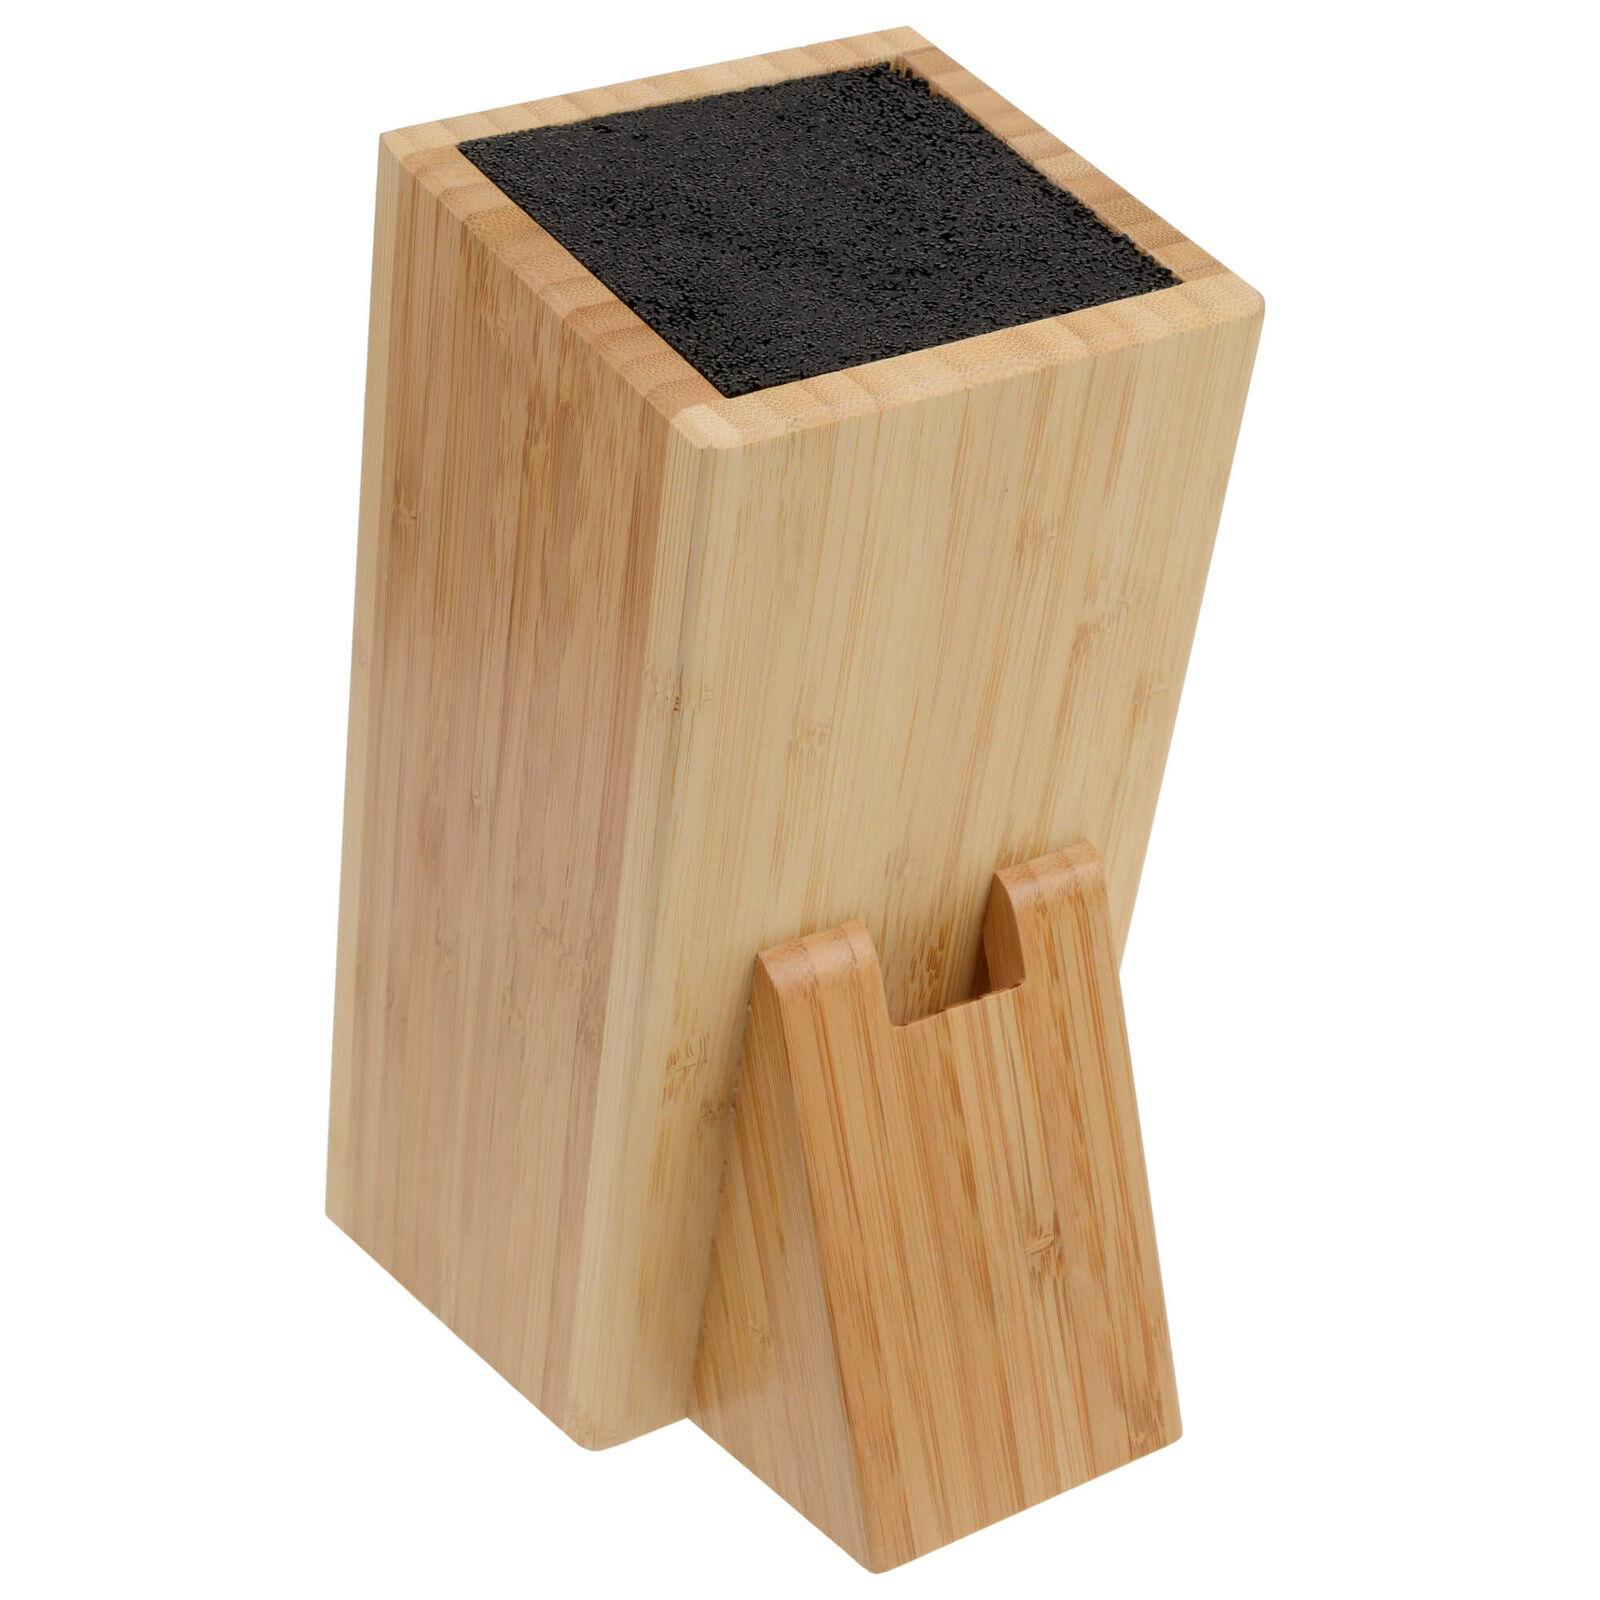 gr we messerblock bambus universal mit borsten leer ohne messer unbest ckt ebay. Black Bedroom Furniture Sets. Home Design Ideas